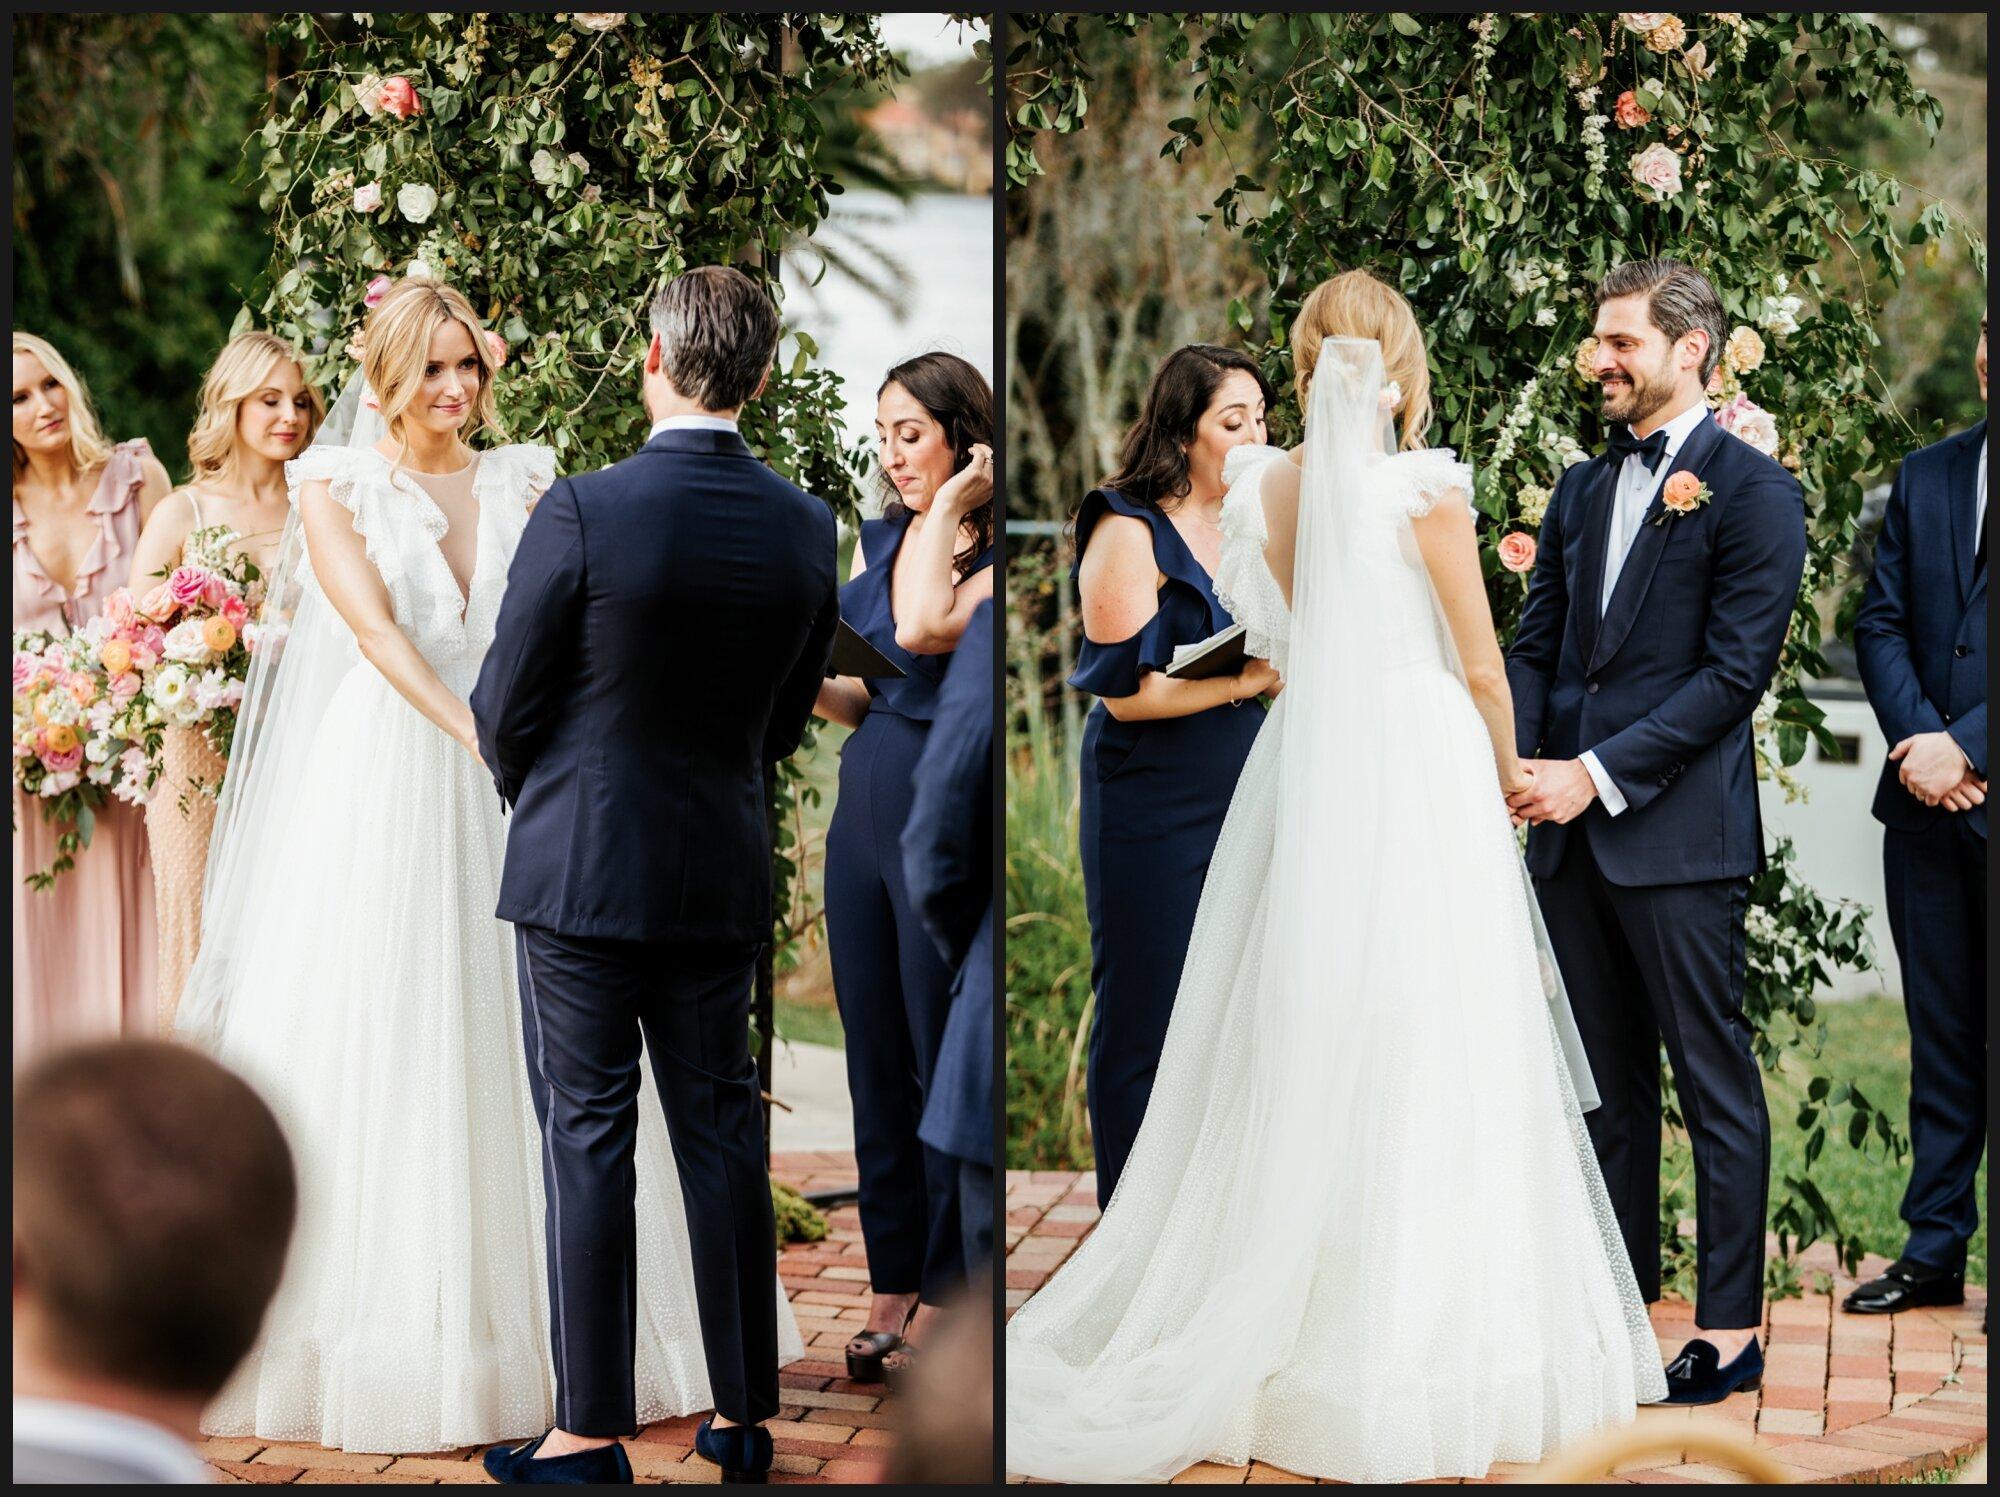 Orlando-Wedding-Photographer-destination-wedding-photographer-florida-wedding-photographer-hawaii-wedding-photographer_0708.jpg